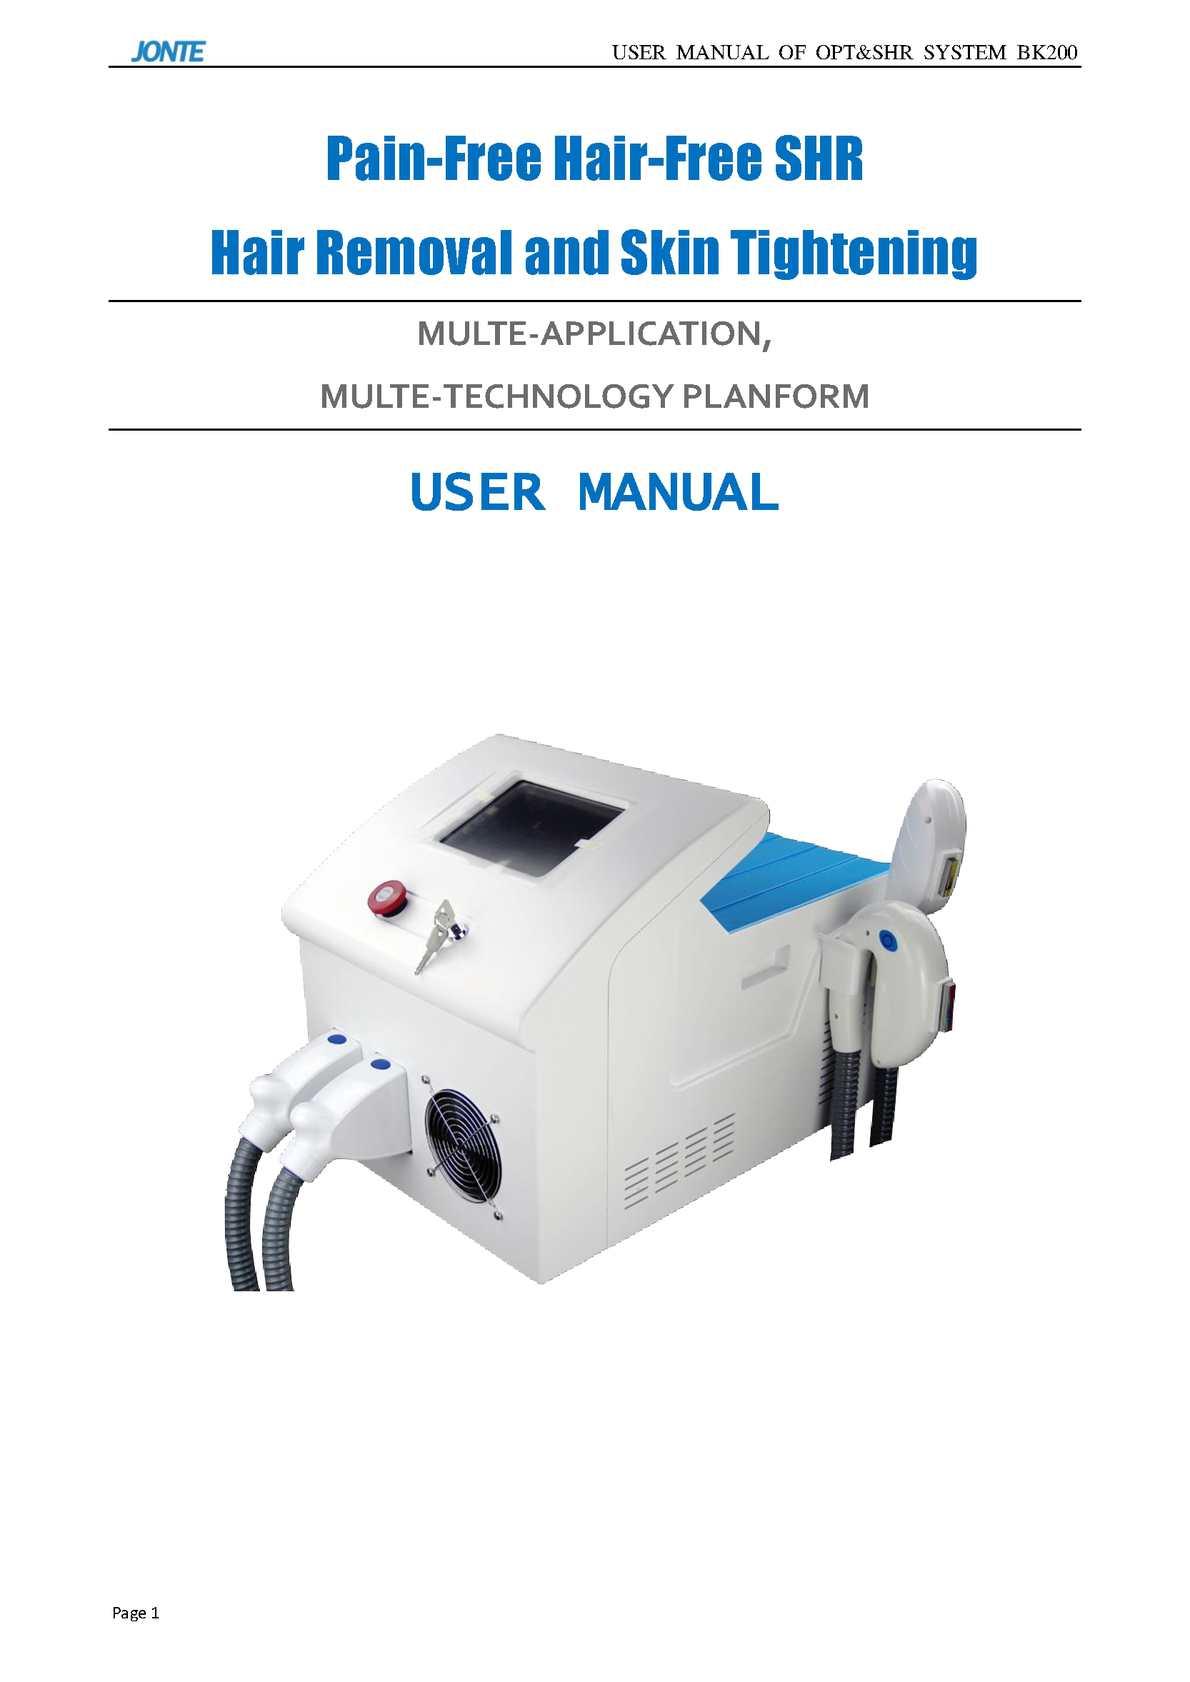 BK200 User Manual -JONTE LASER